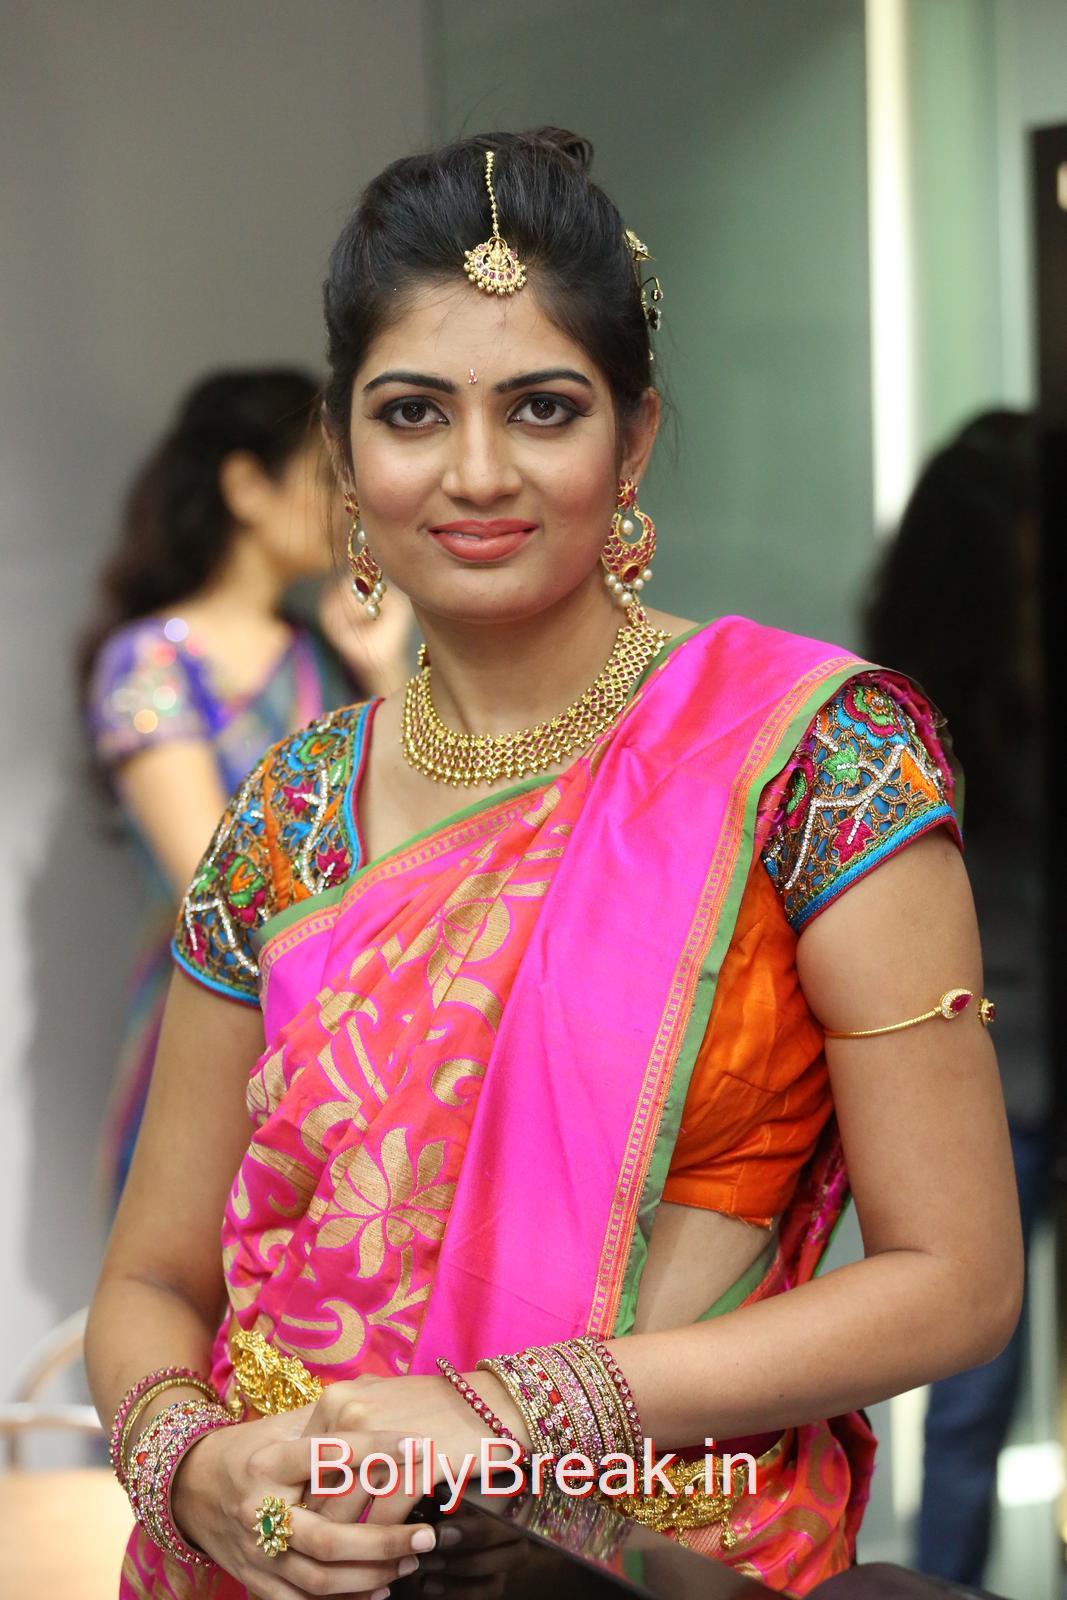 Akanksha Unseen Stills, Akanksha Hot Pics from Bridal Dream Make up At Lakme Salon